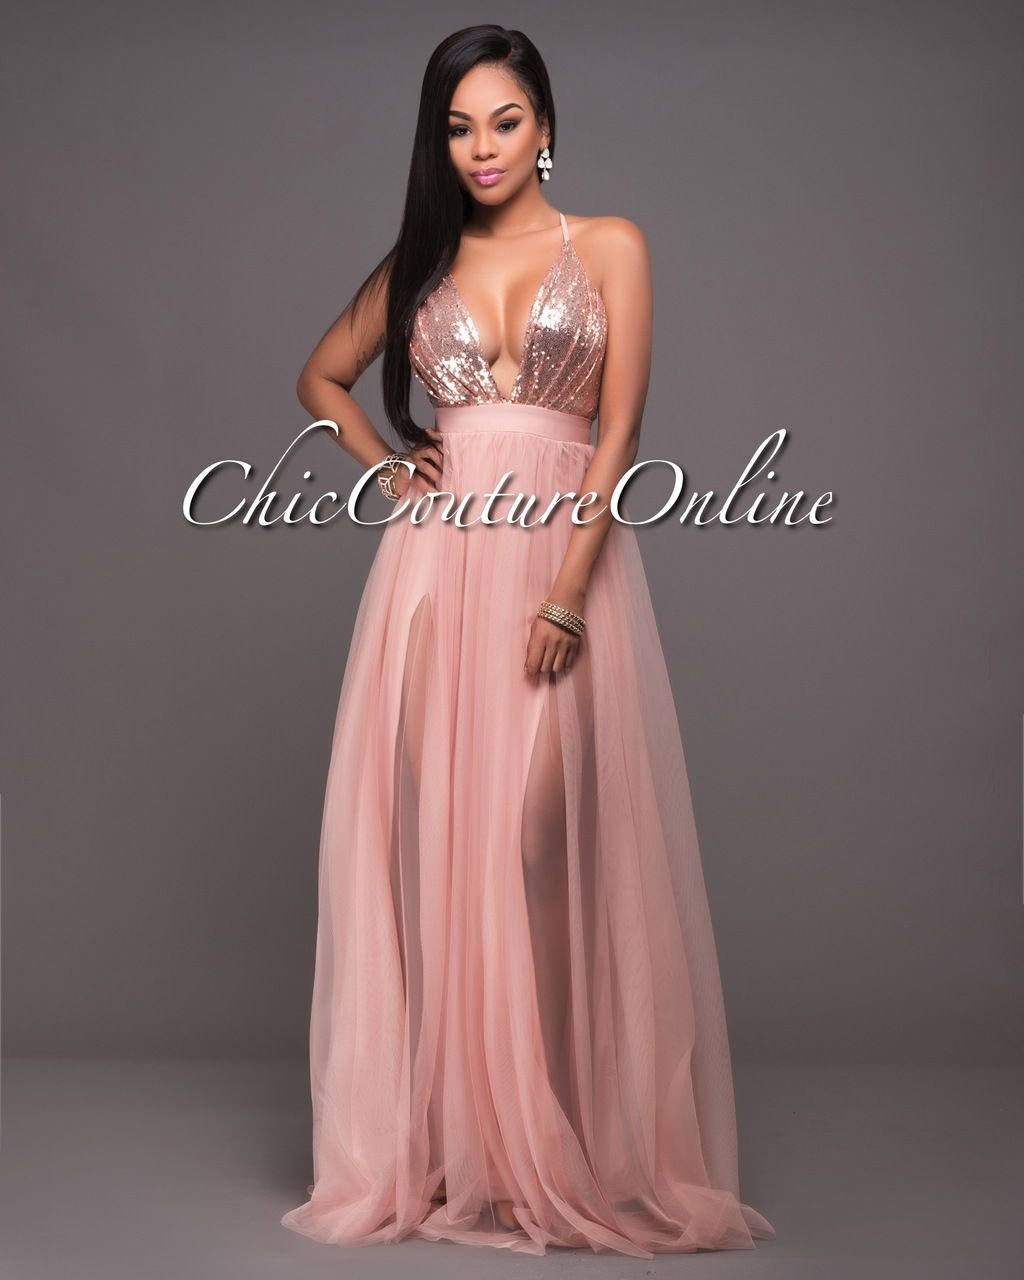 Paloma Blush Tulle Rose Gold Sequins Maxi Dress